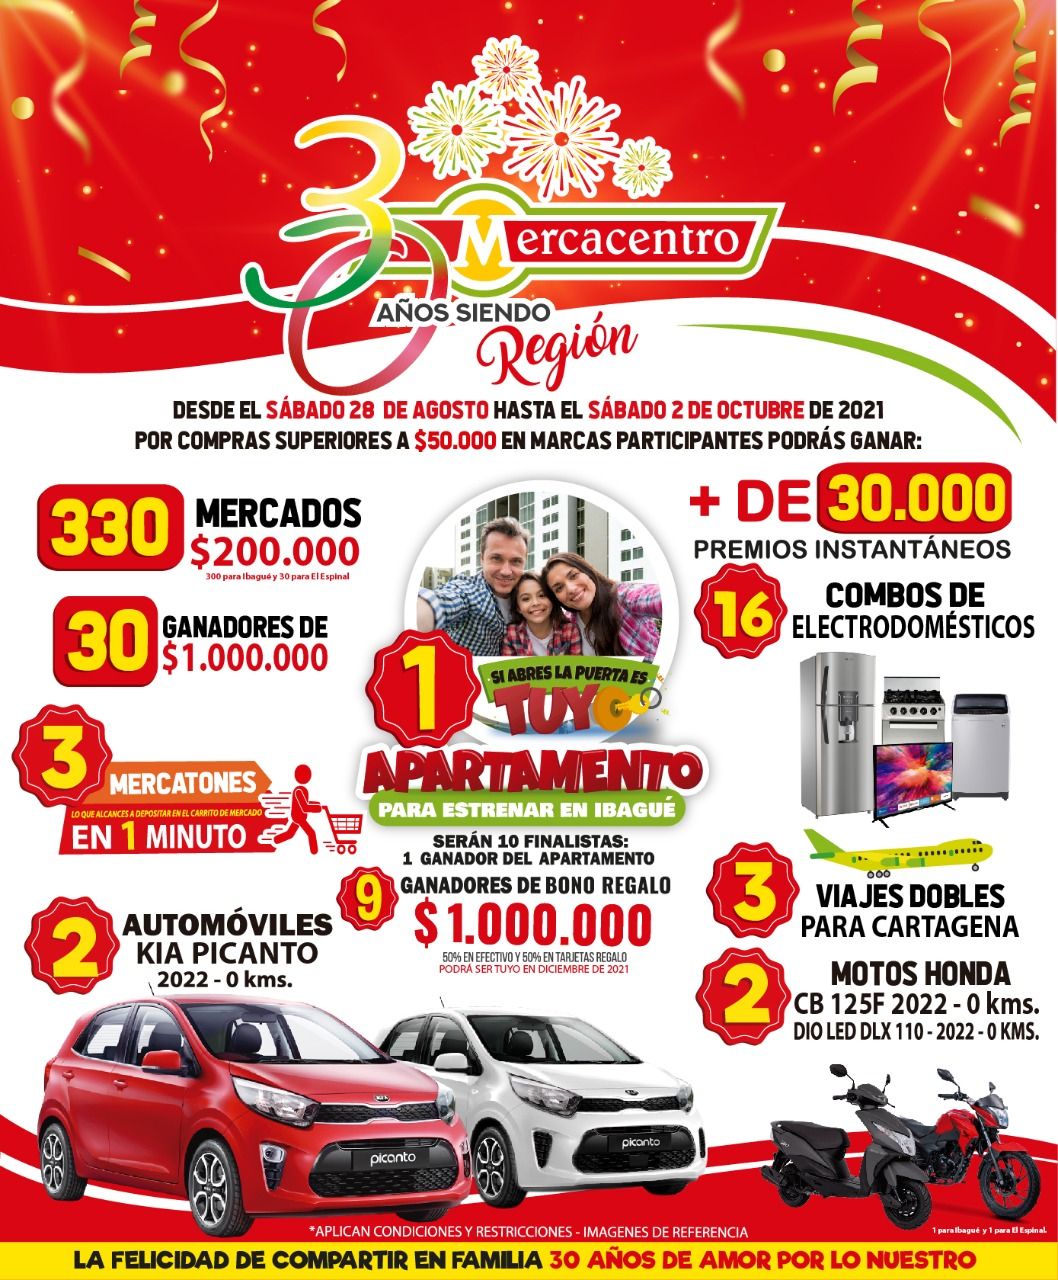 Supermercados Mercacentro cumple 30 años 4